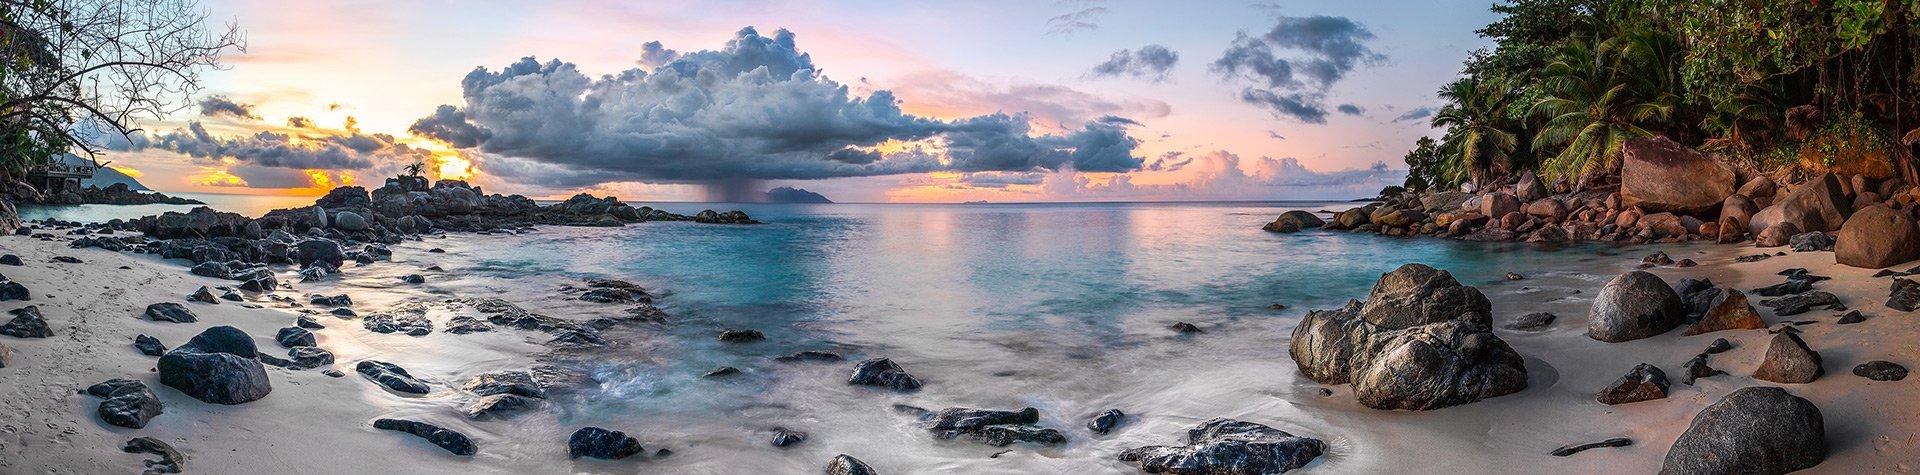 Seycehhles Mahe Island Silhouette Island copyright Krijn van der Giessen Photography